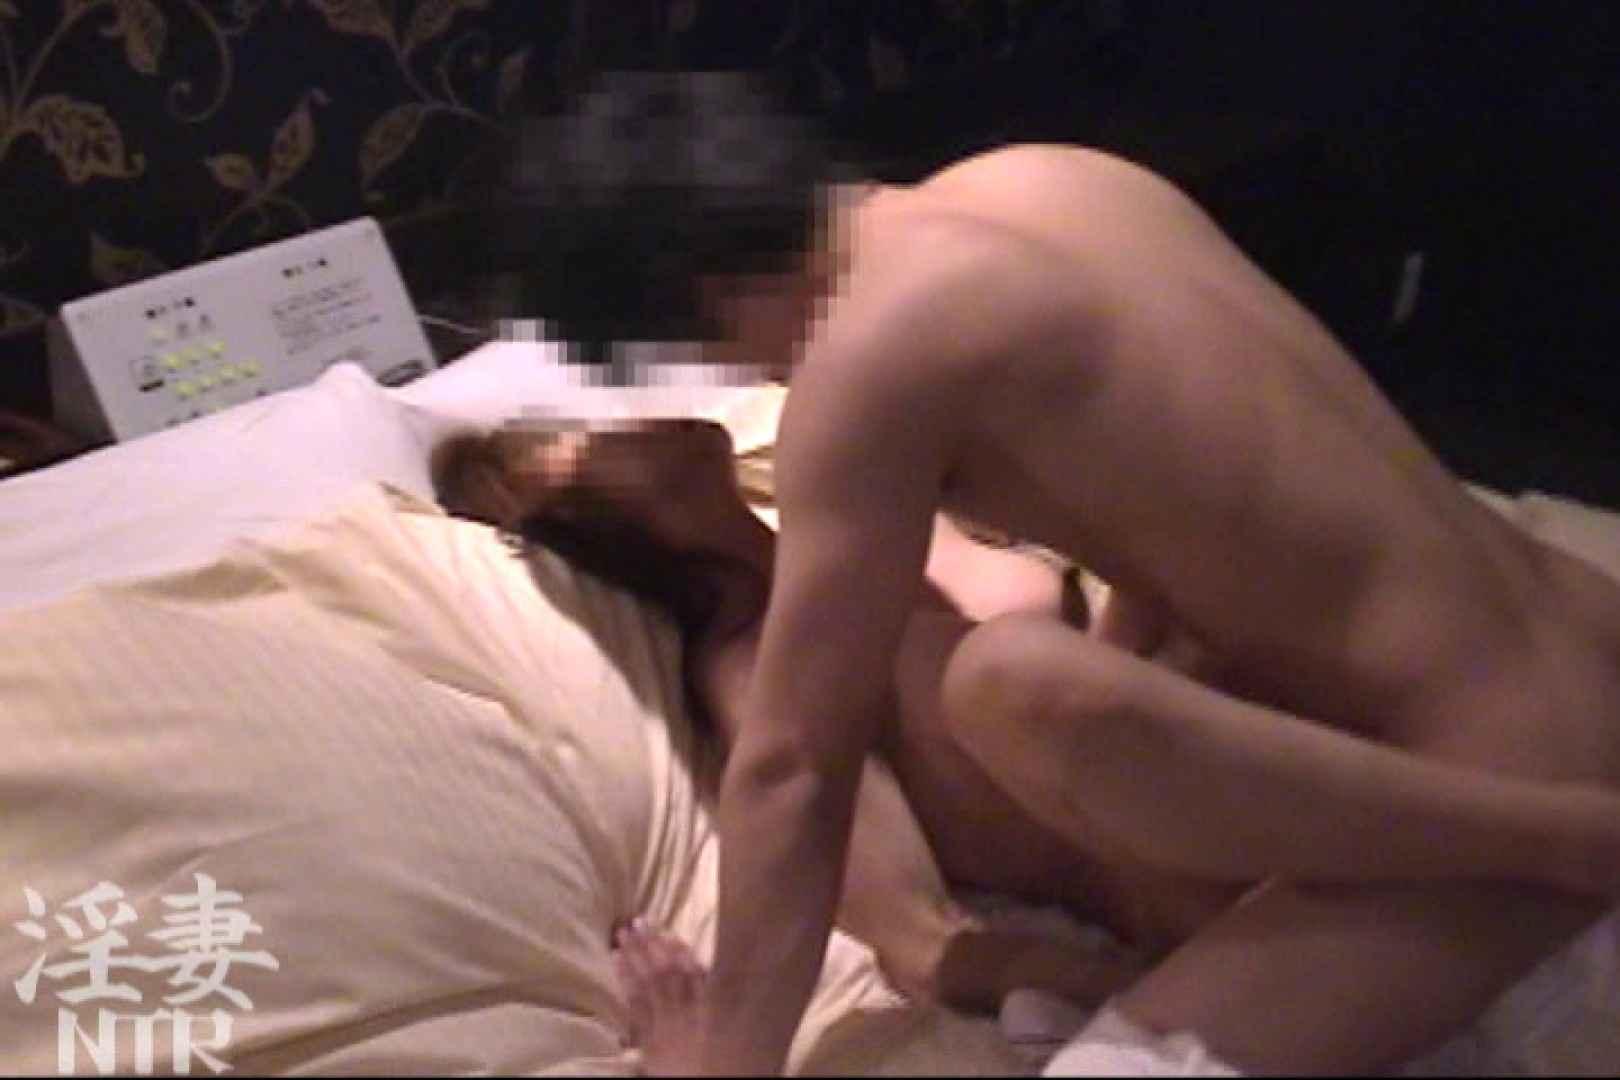 淫乱彩女 麻優里 28歳の単独男性の他人棒 2 他人棒   性欲  71pic 13